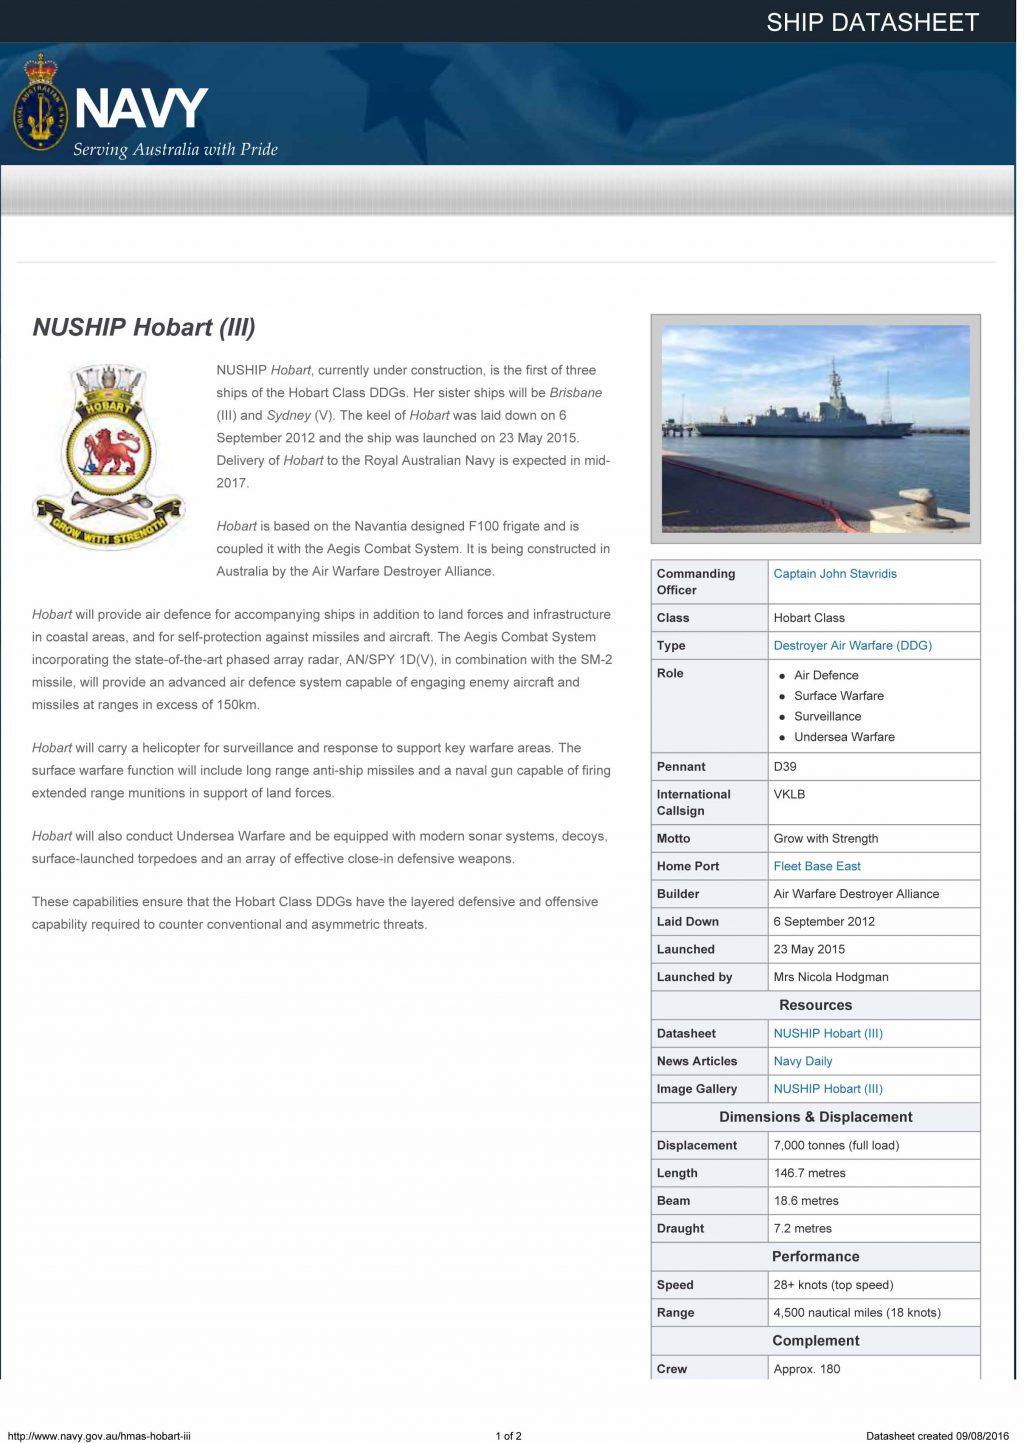 NUSHIP Hobart (III) | Royal Australian Navy